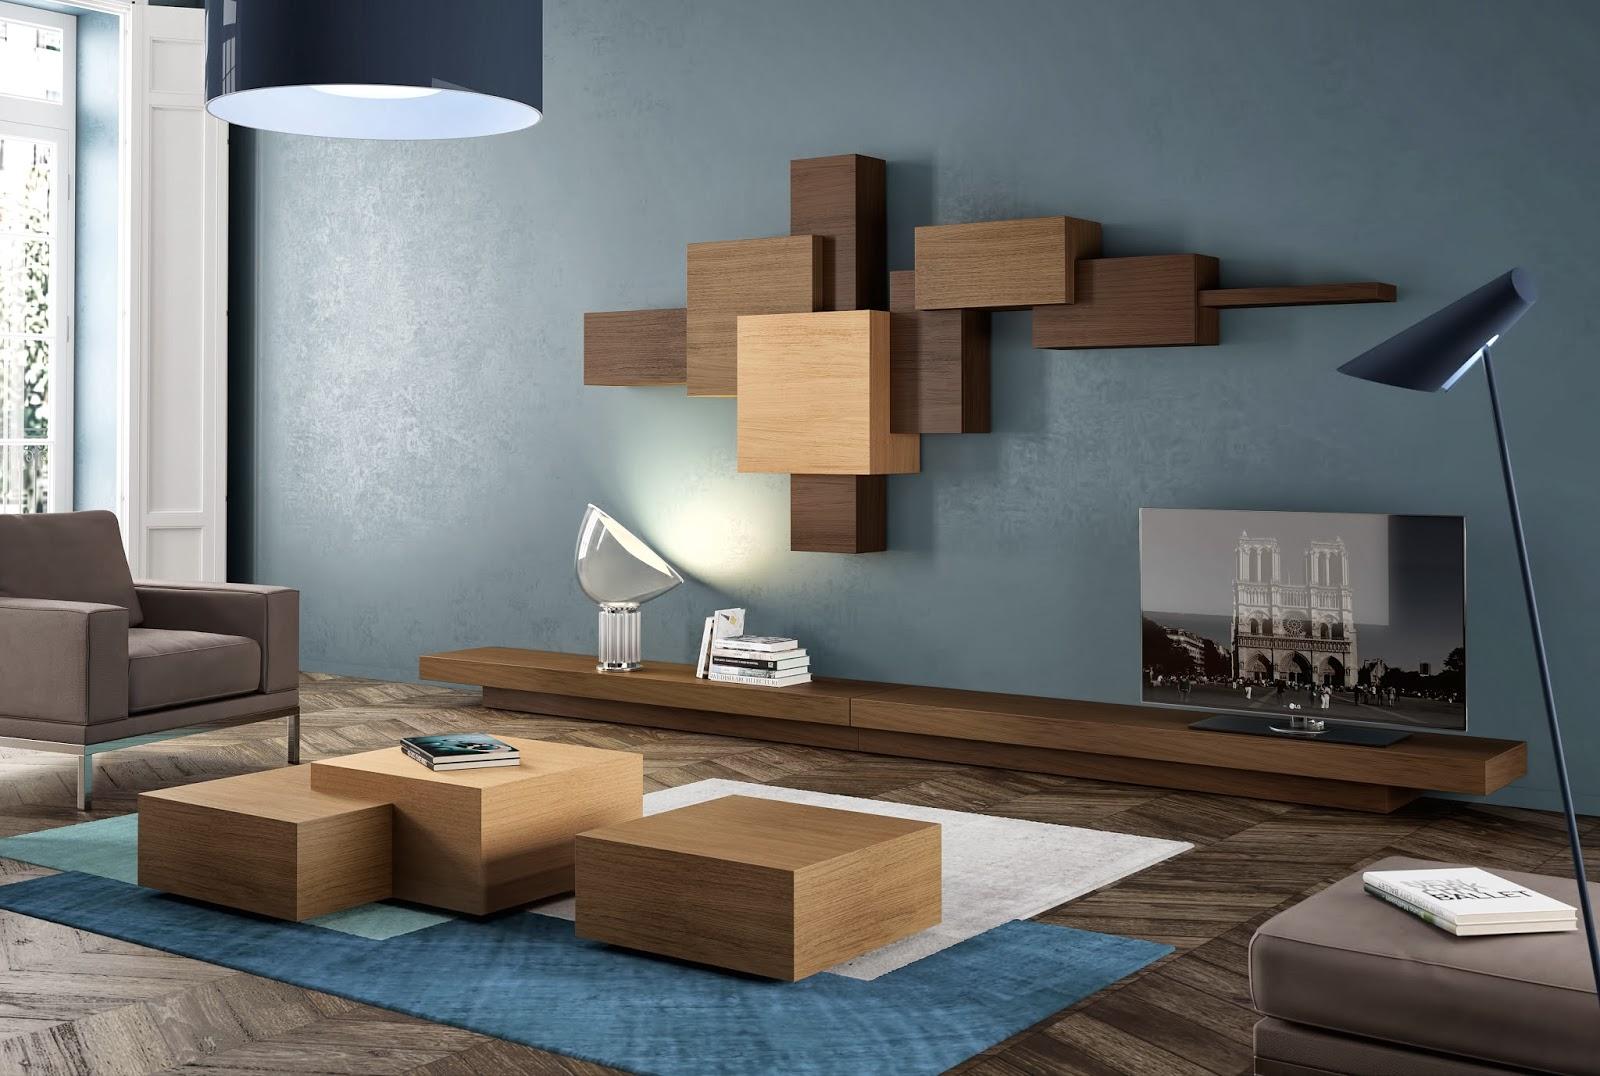 http://www.portobellostreet.es/mueble/27786/Salon-Moderno-Cubista-IV